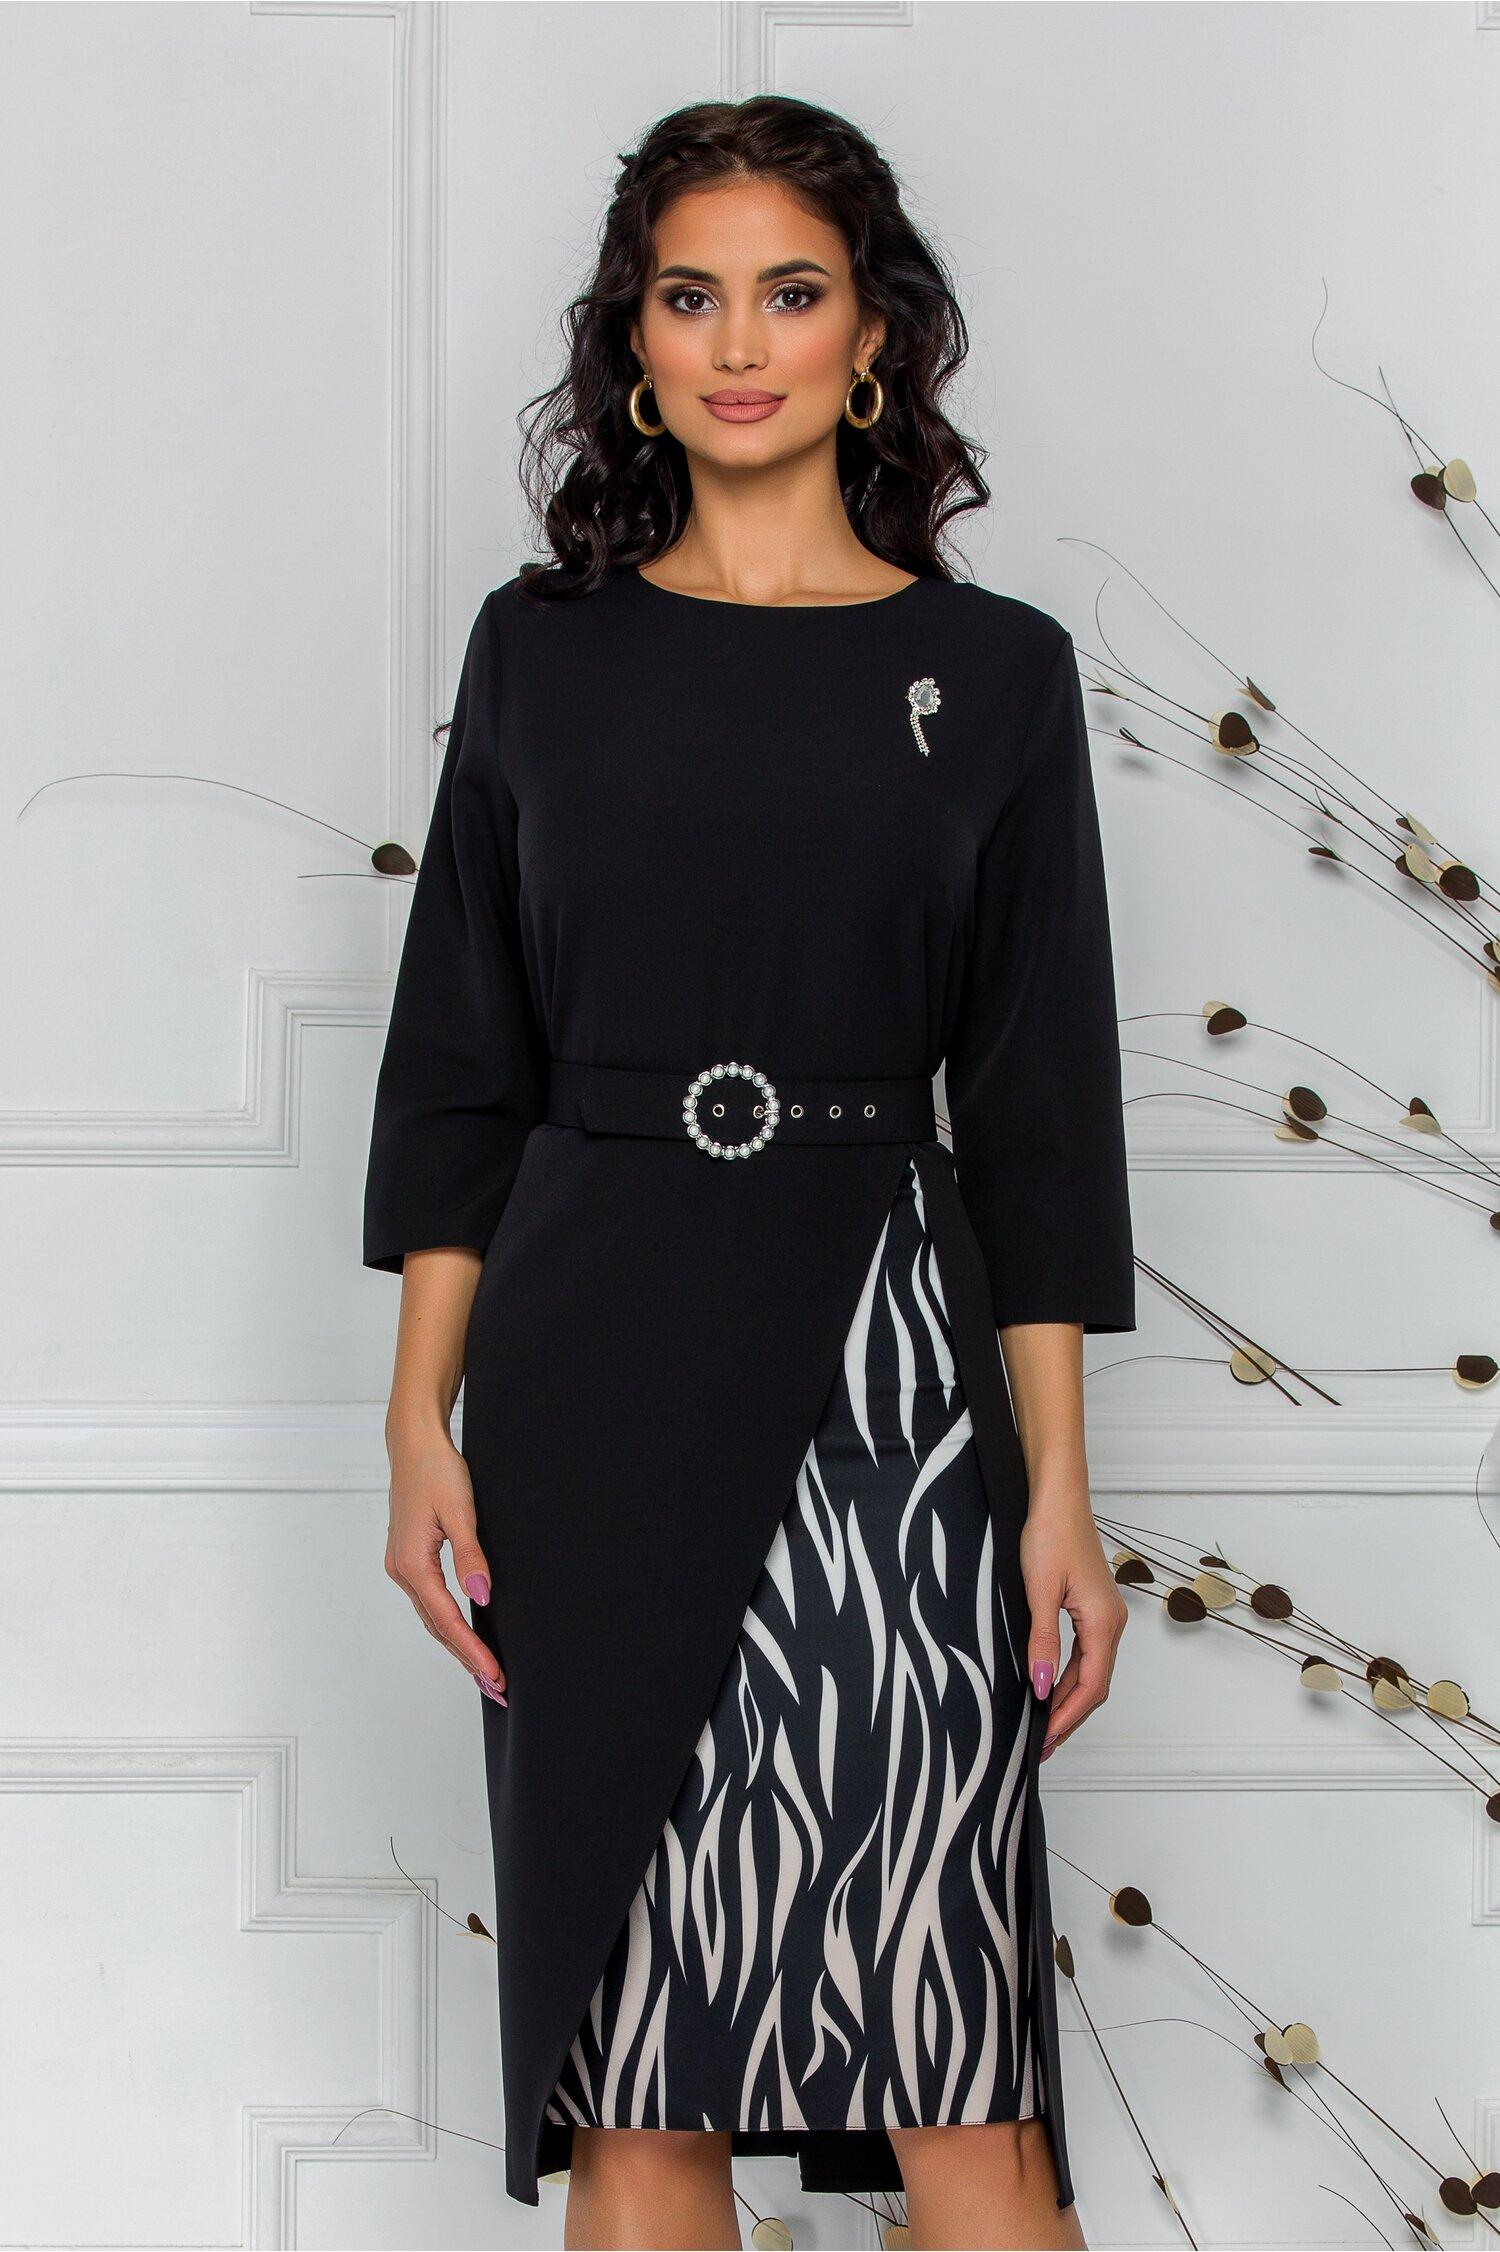 Rochie Simona neagra cu imprimeu pe fusta